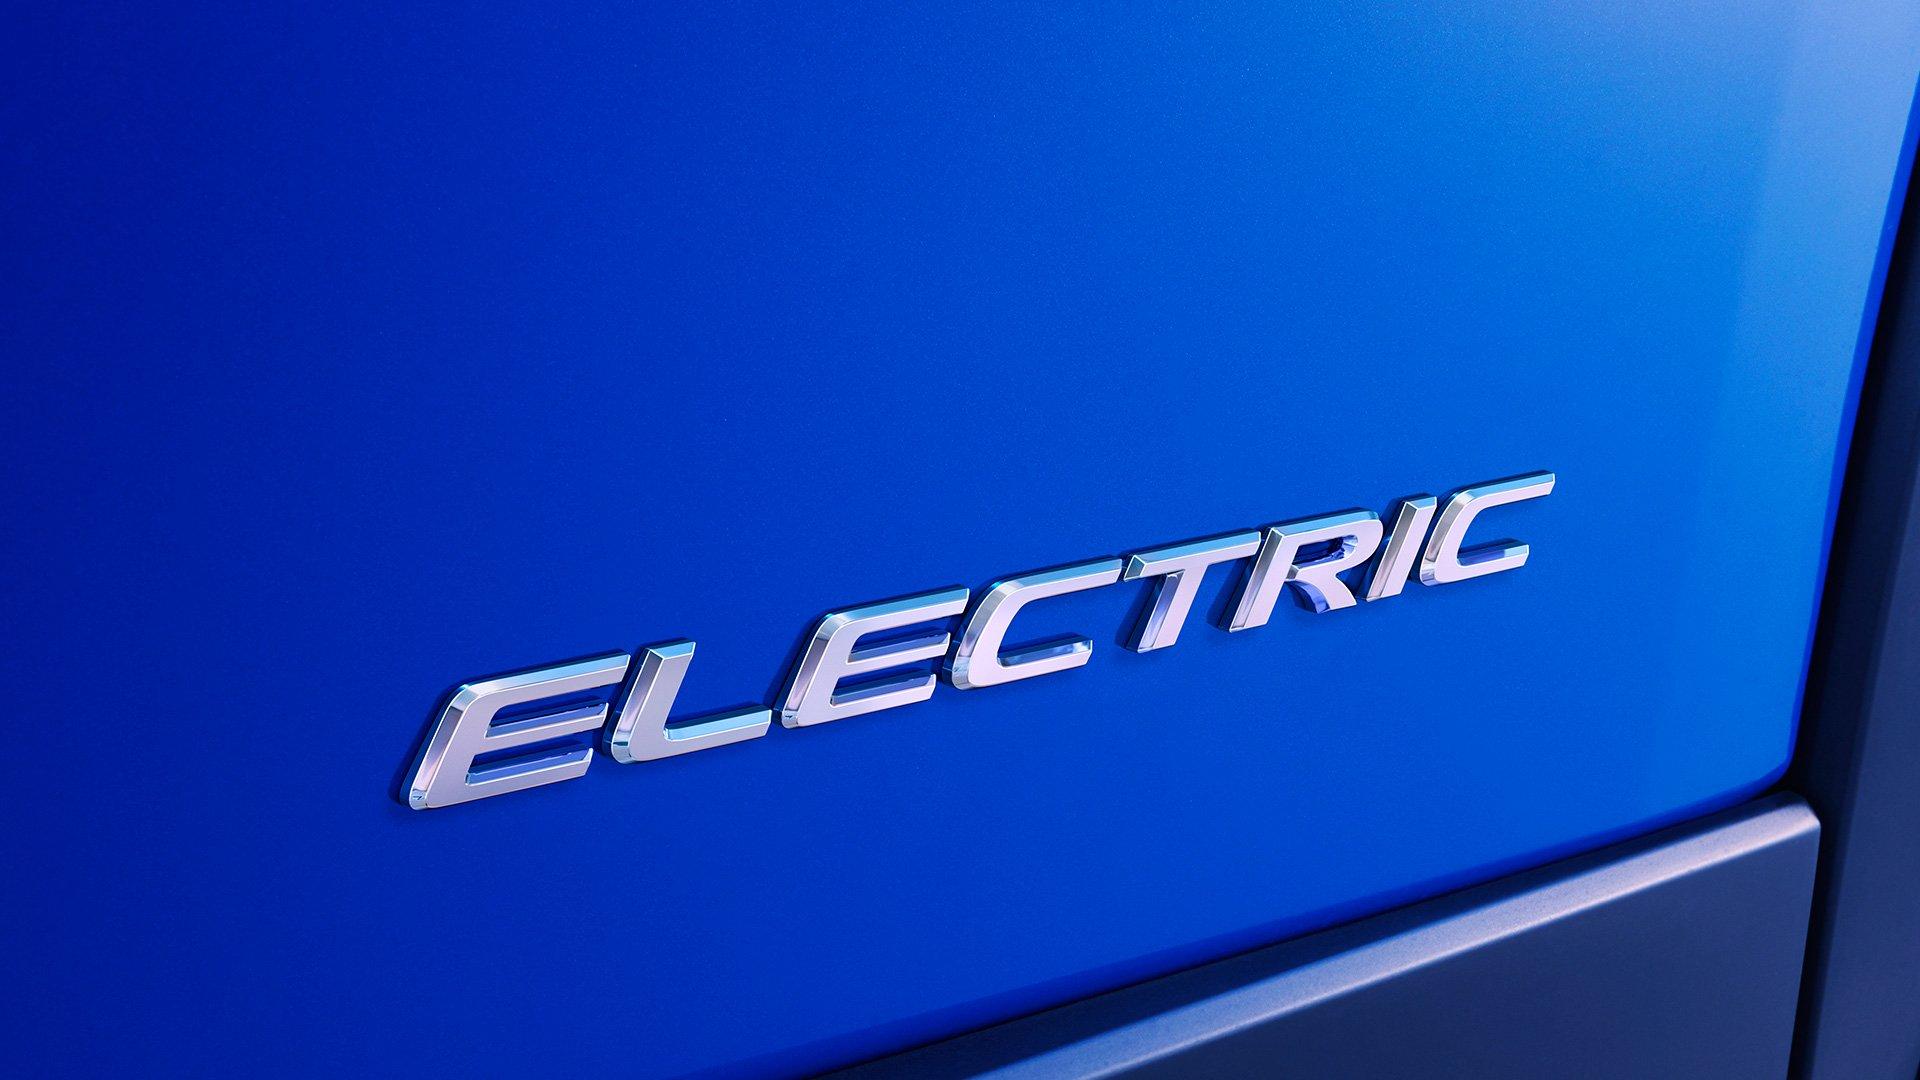 2020 Lexus Electric Production Vehicle Teaser